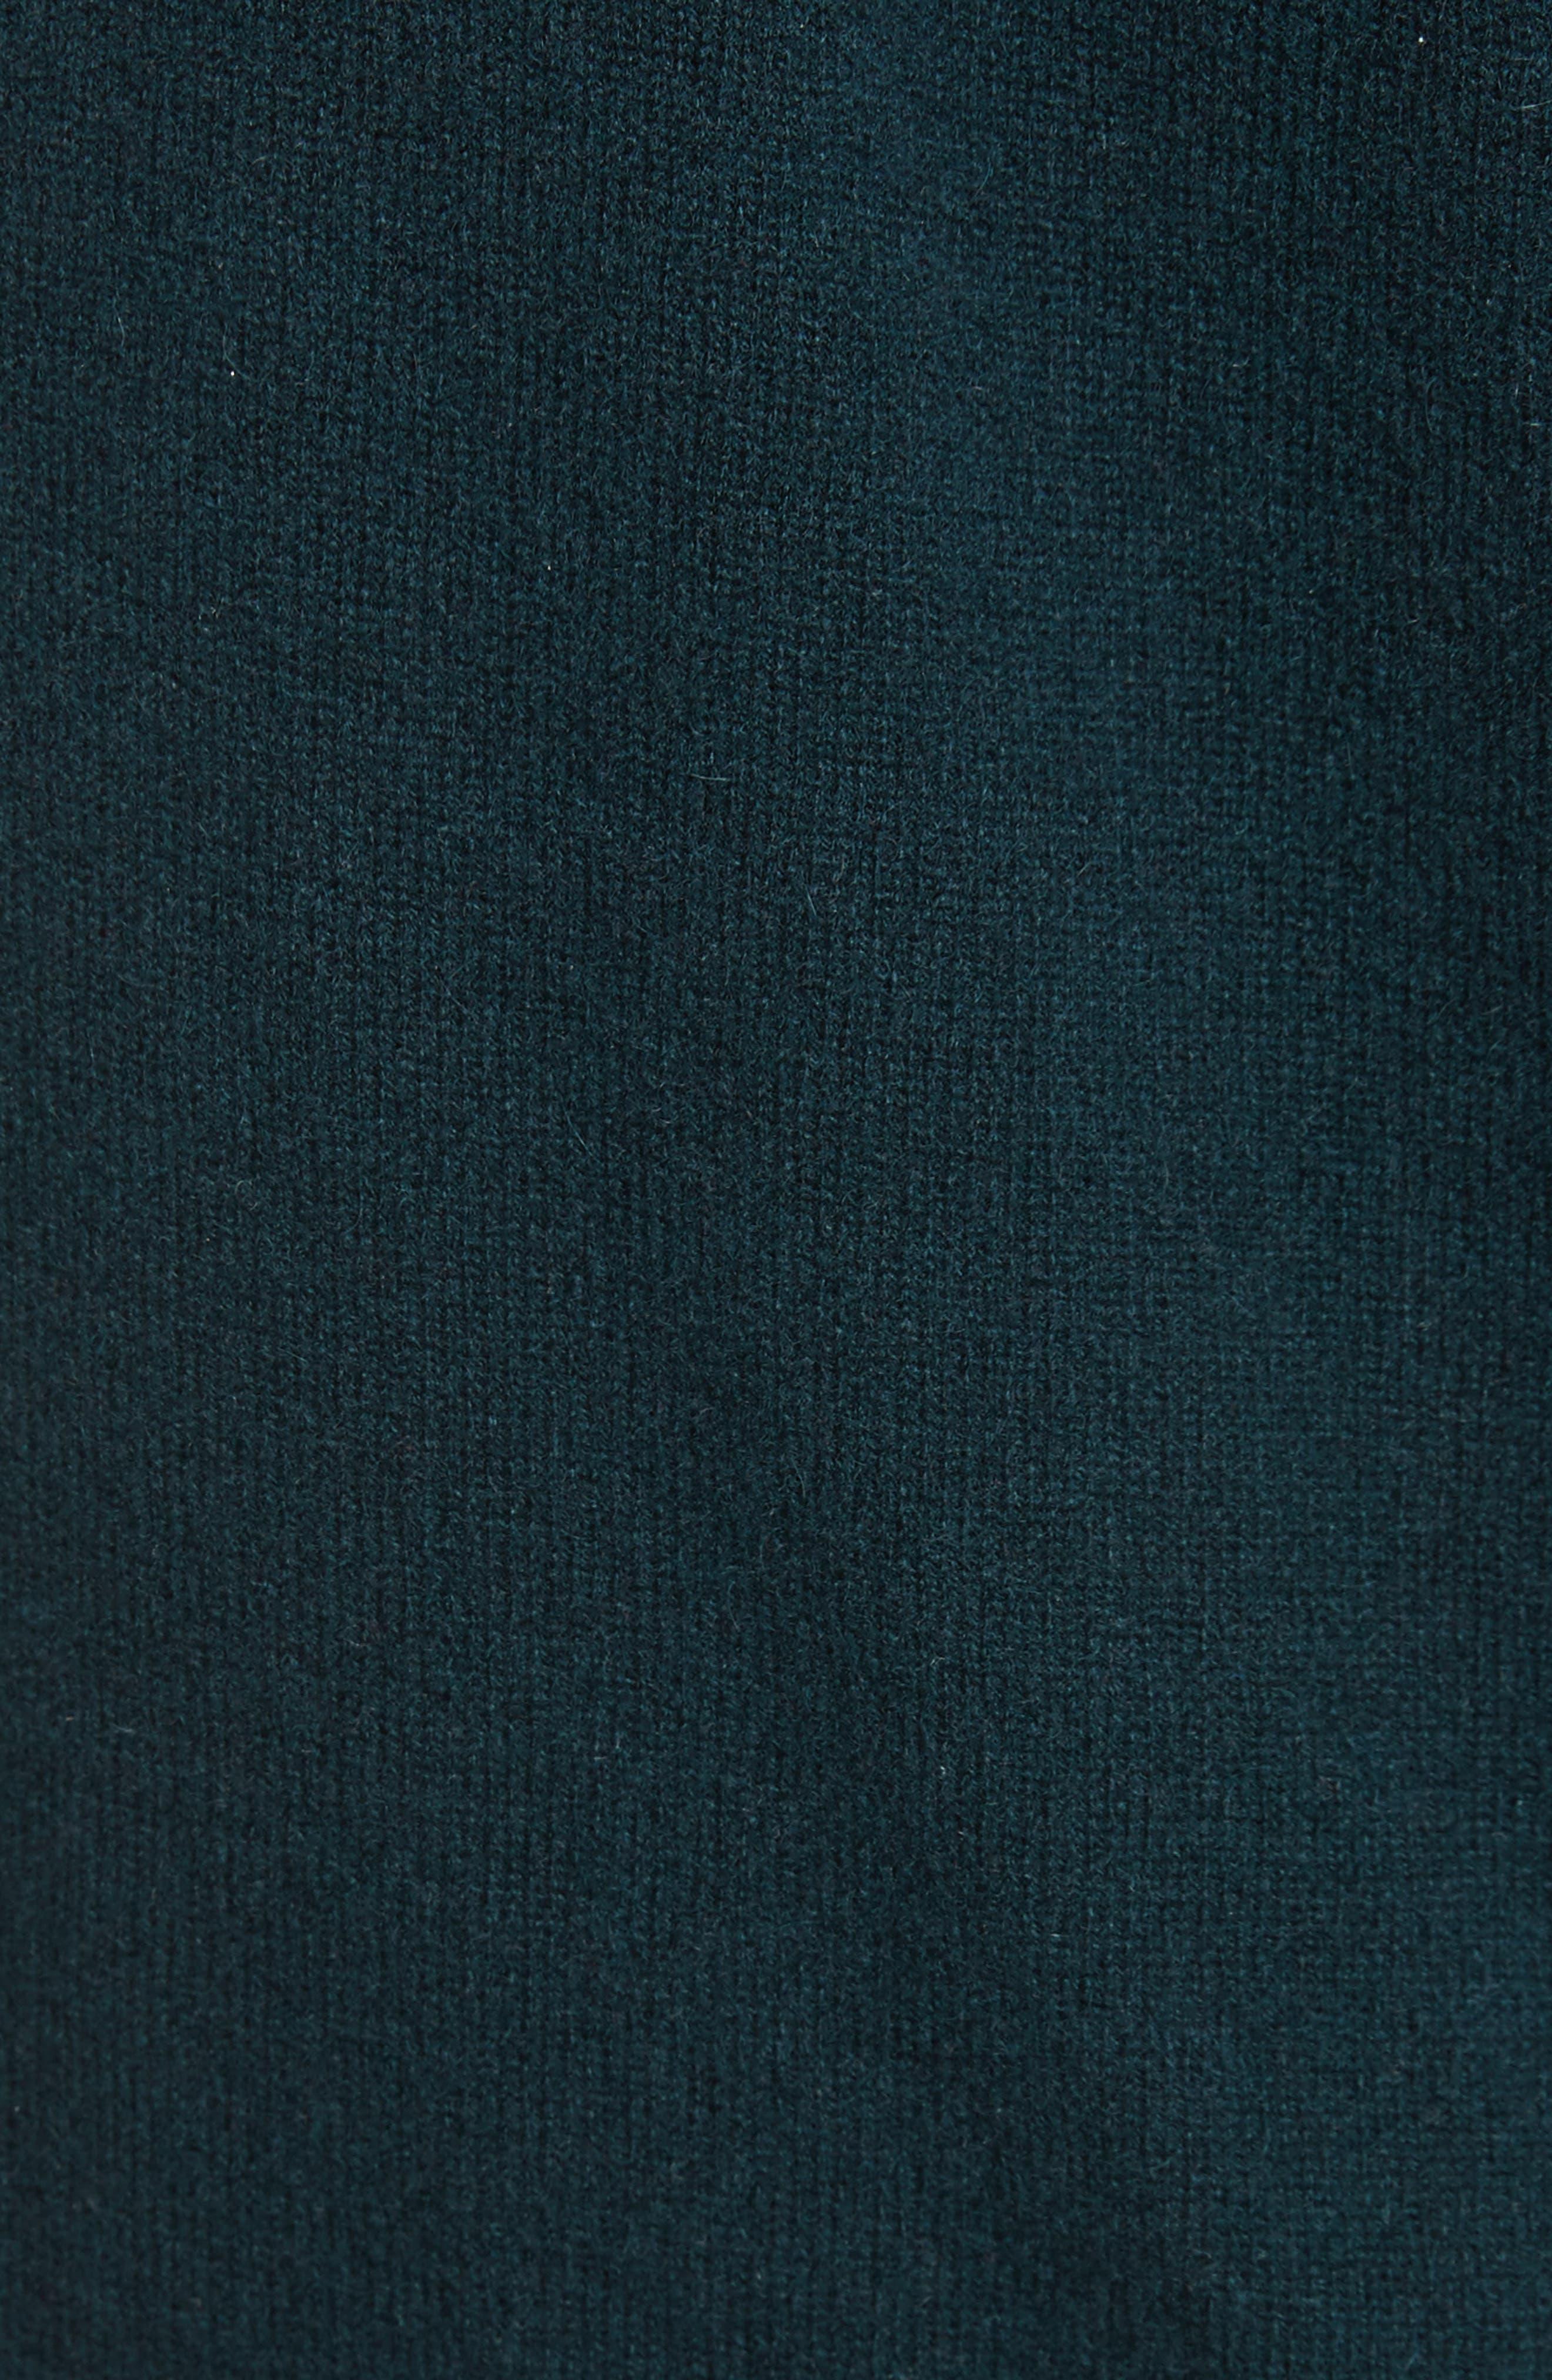 Velvet Tie Cashmere Sweater,                             Alternate thumbnail 5, color,                             320